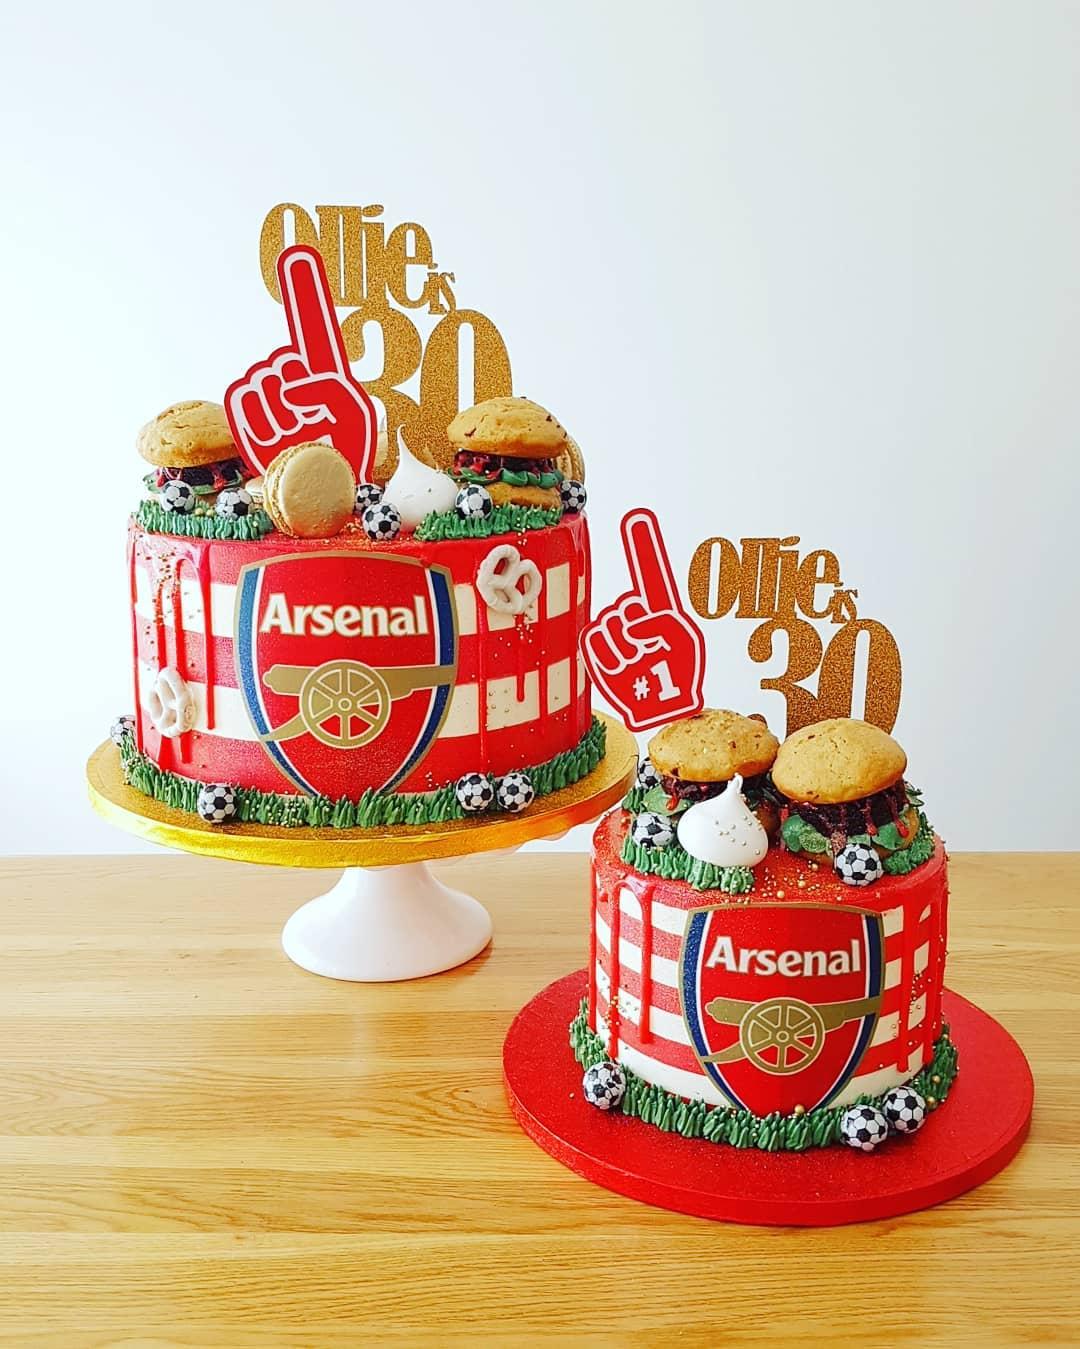 Arsenal & Burgers cake